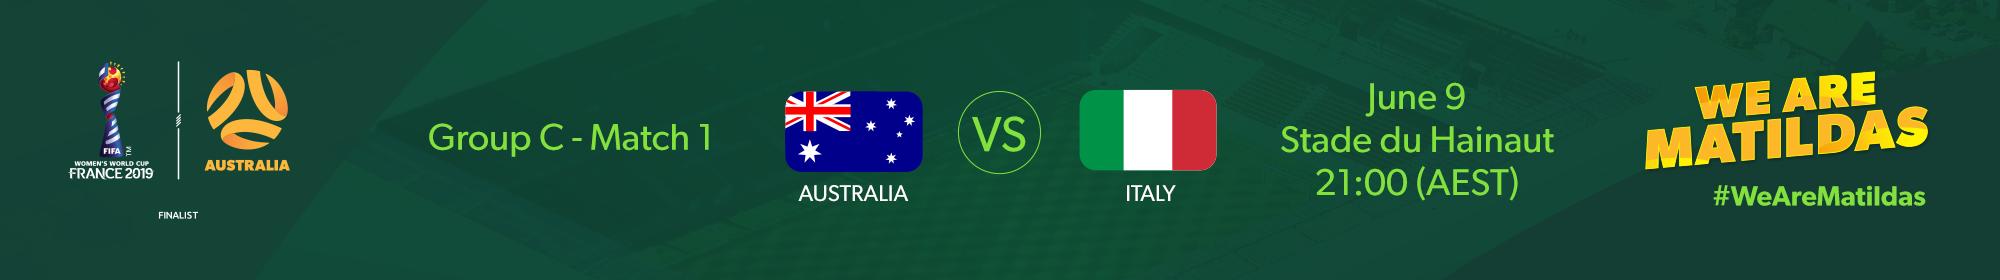 Matildas v Italy Fixture